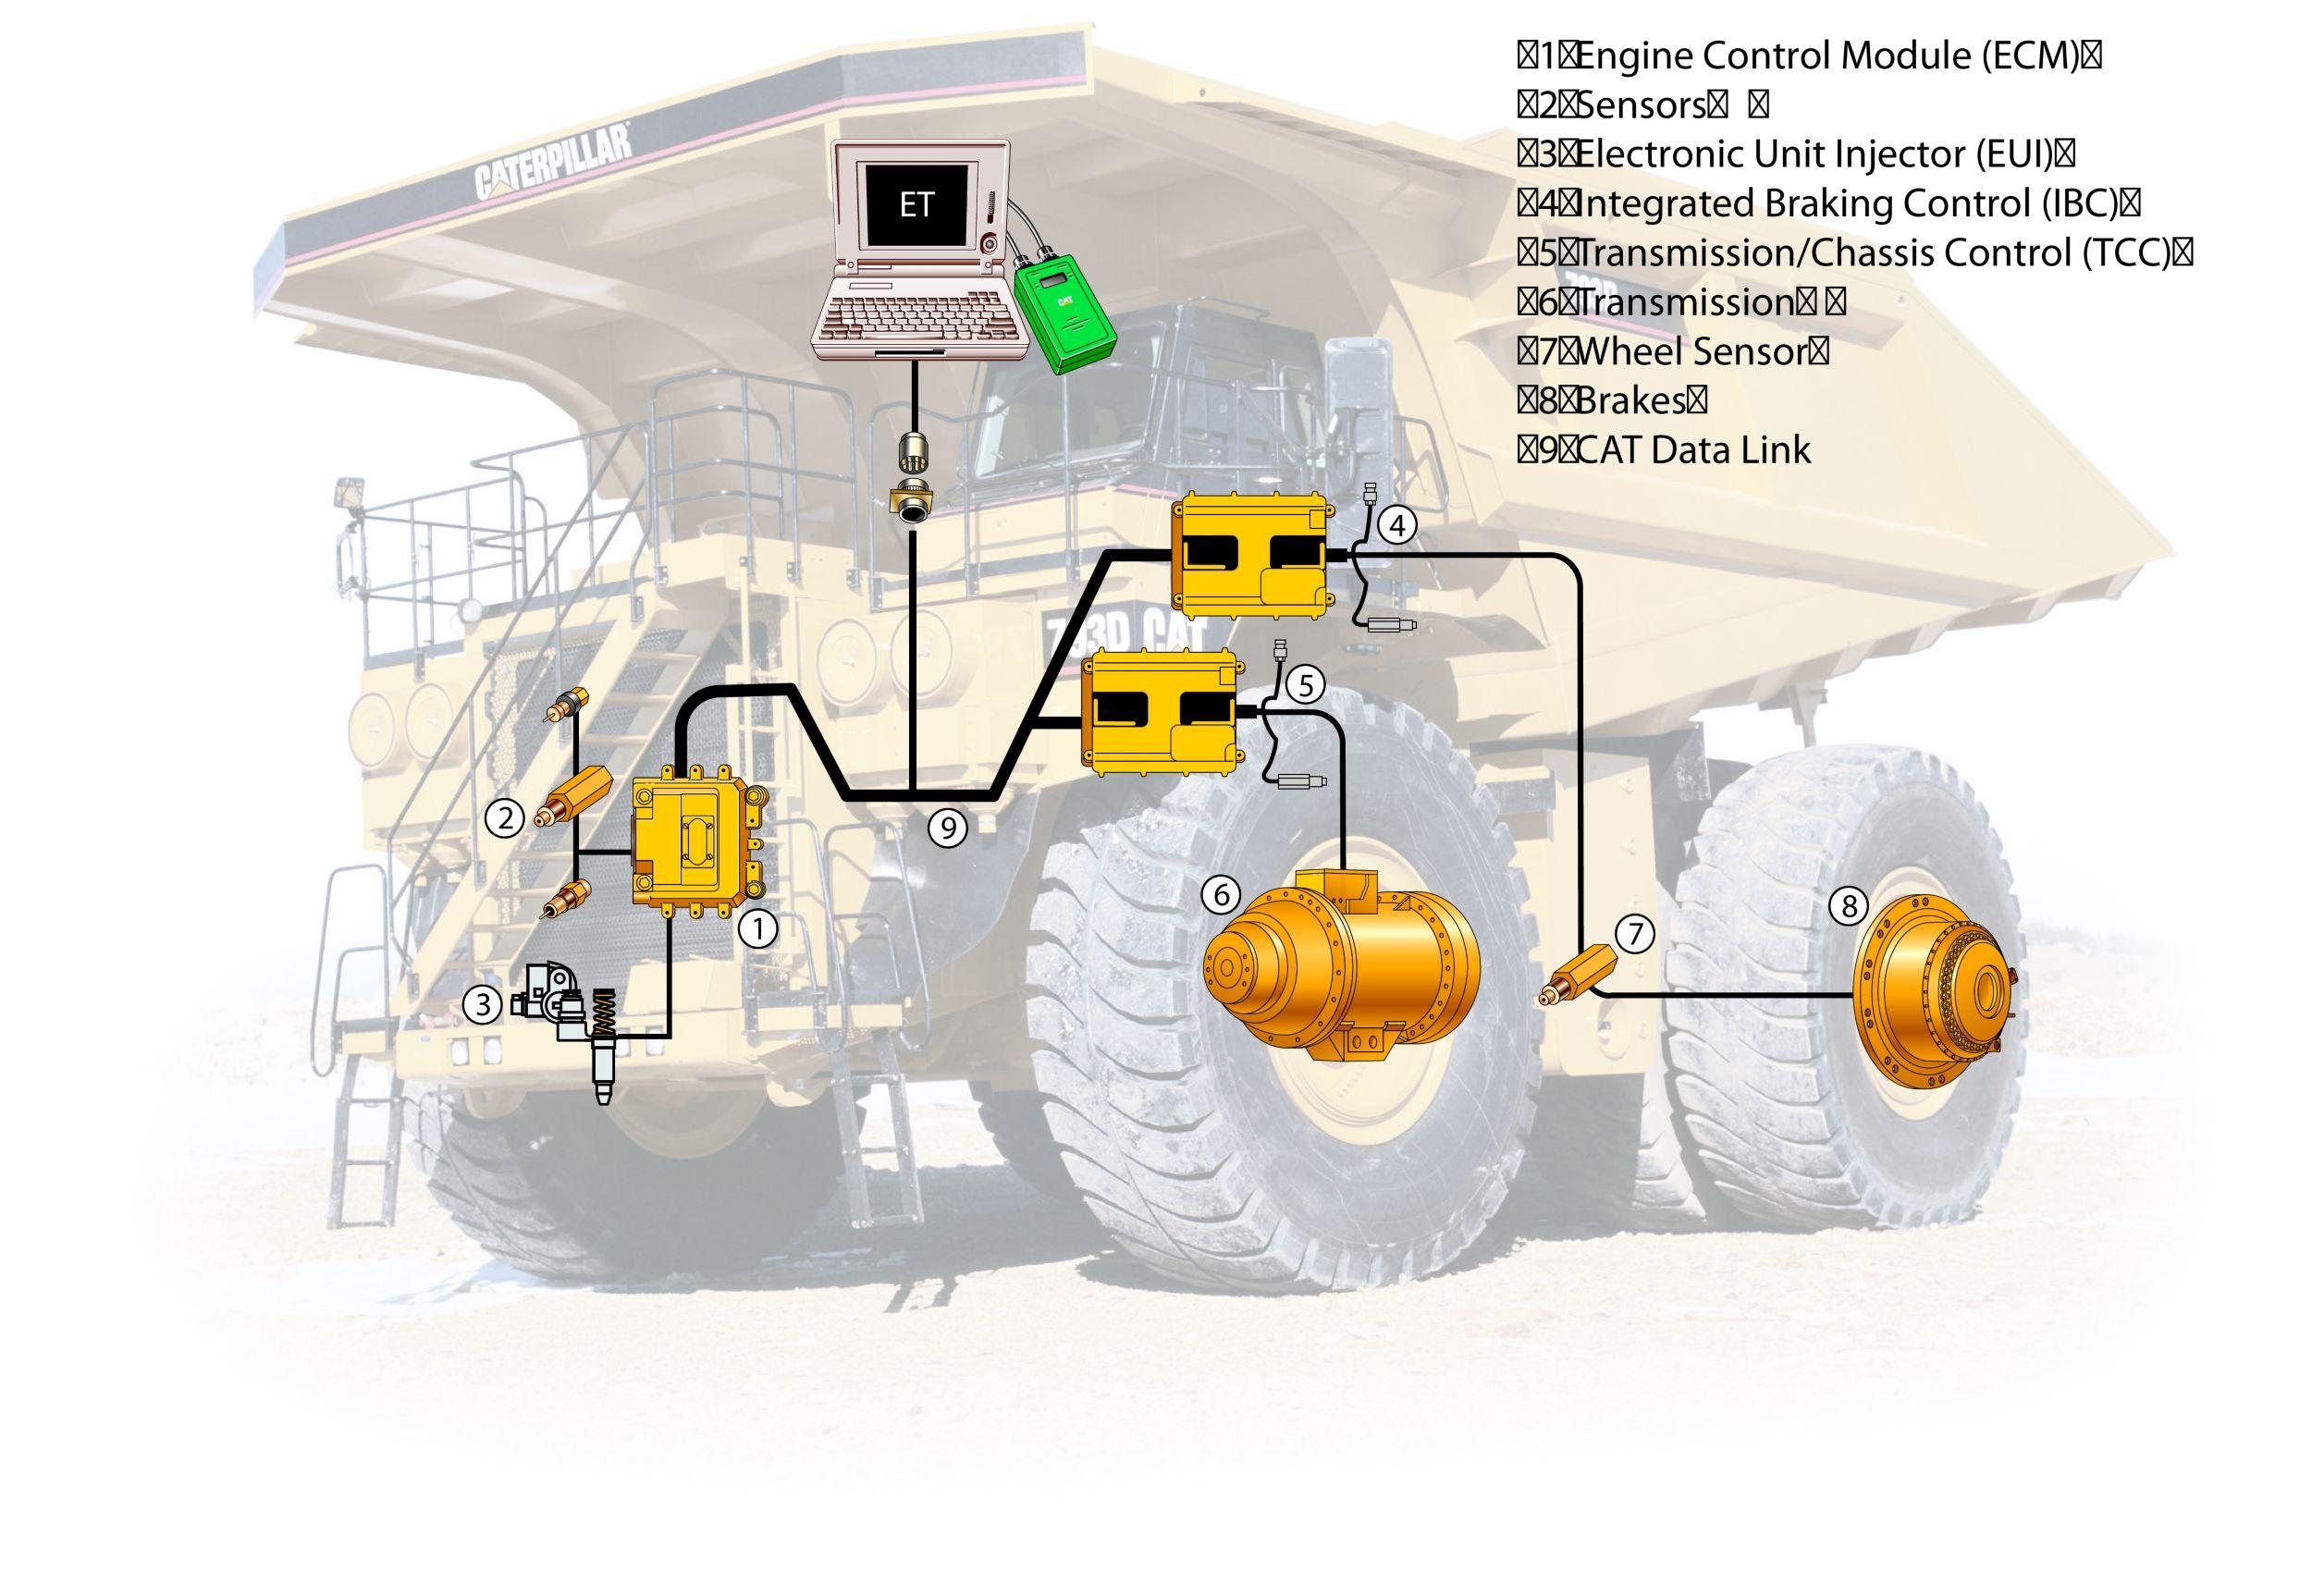 Engine/Power Train Integration